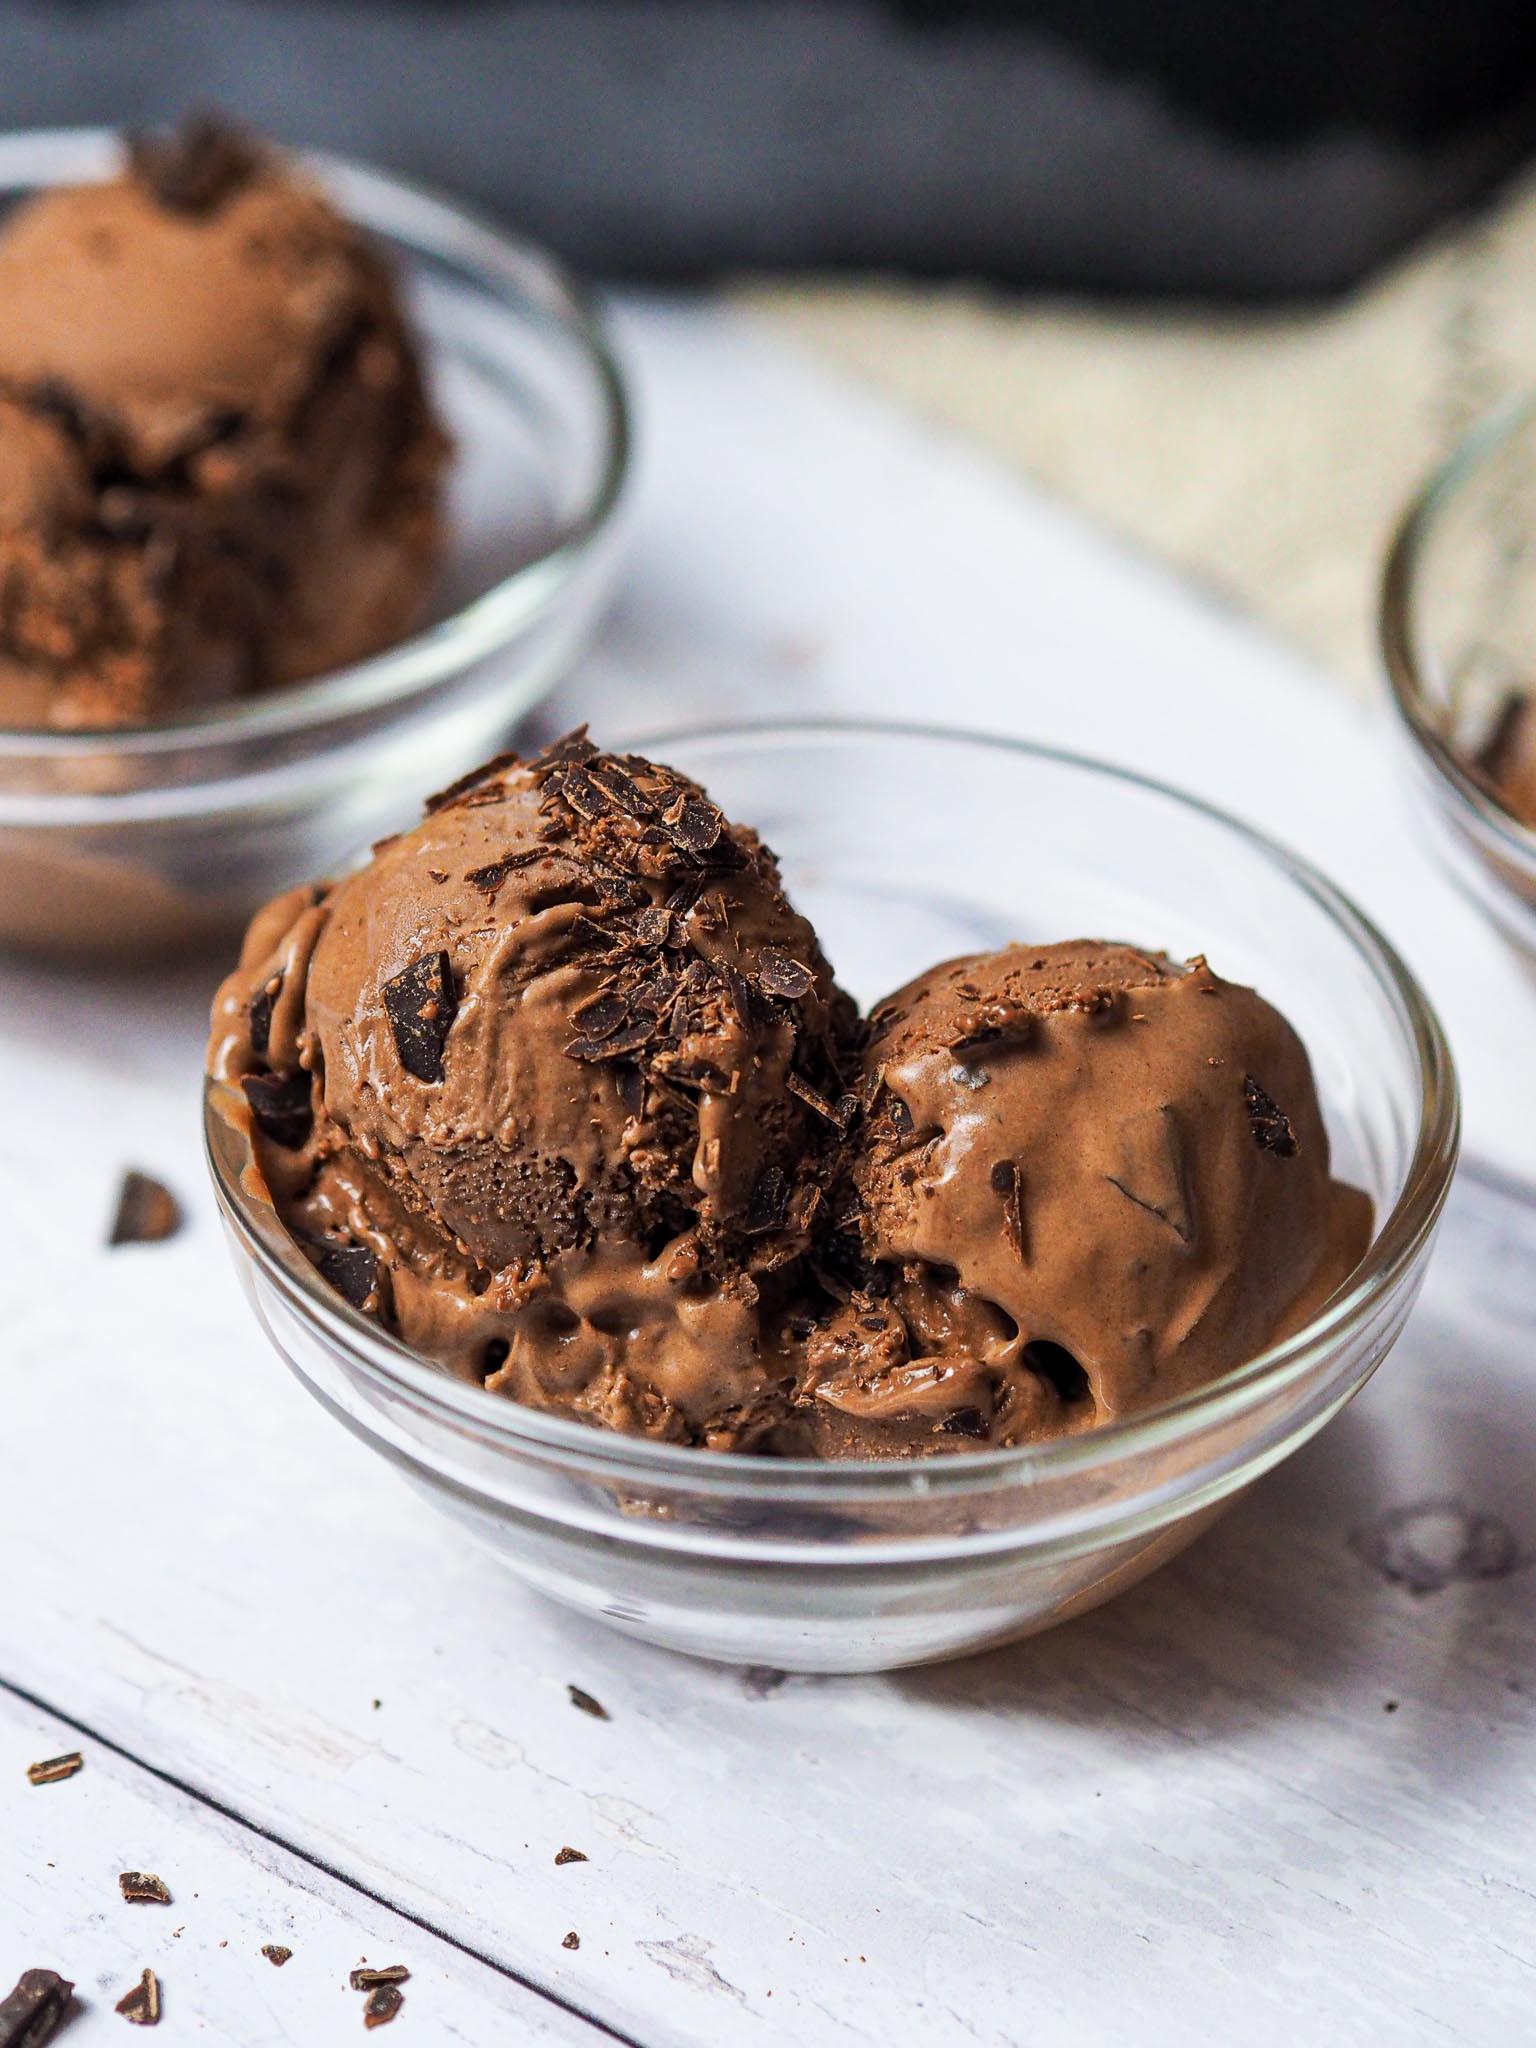 Chocolate brownie recipe step 8